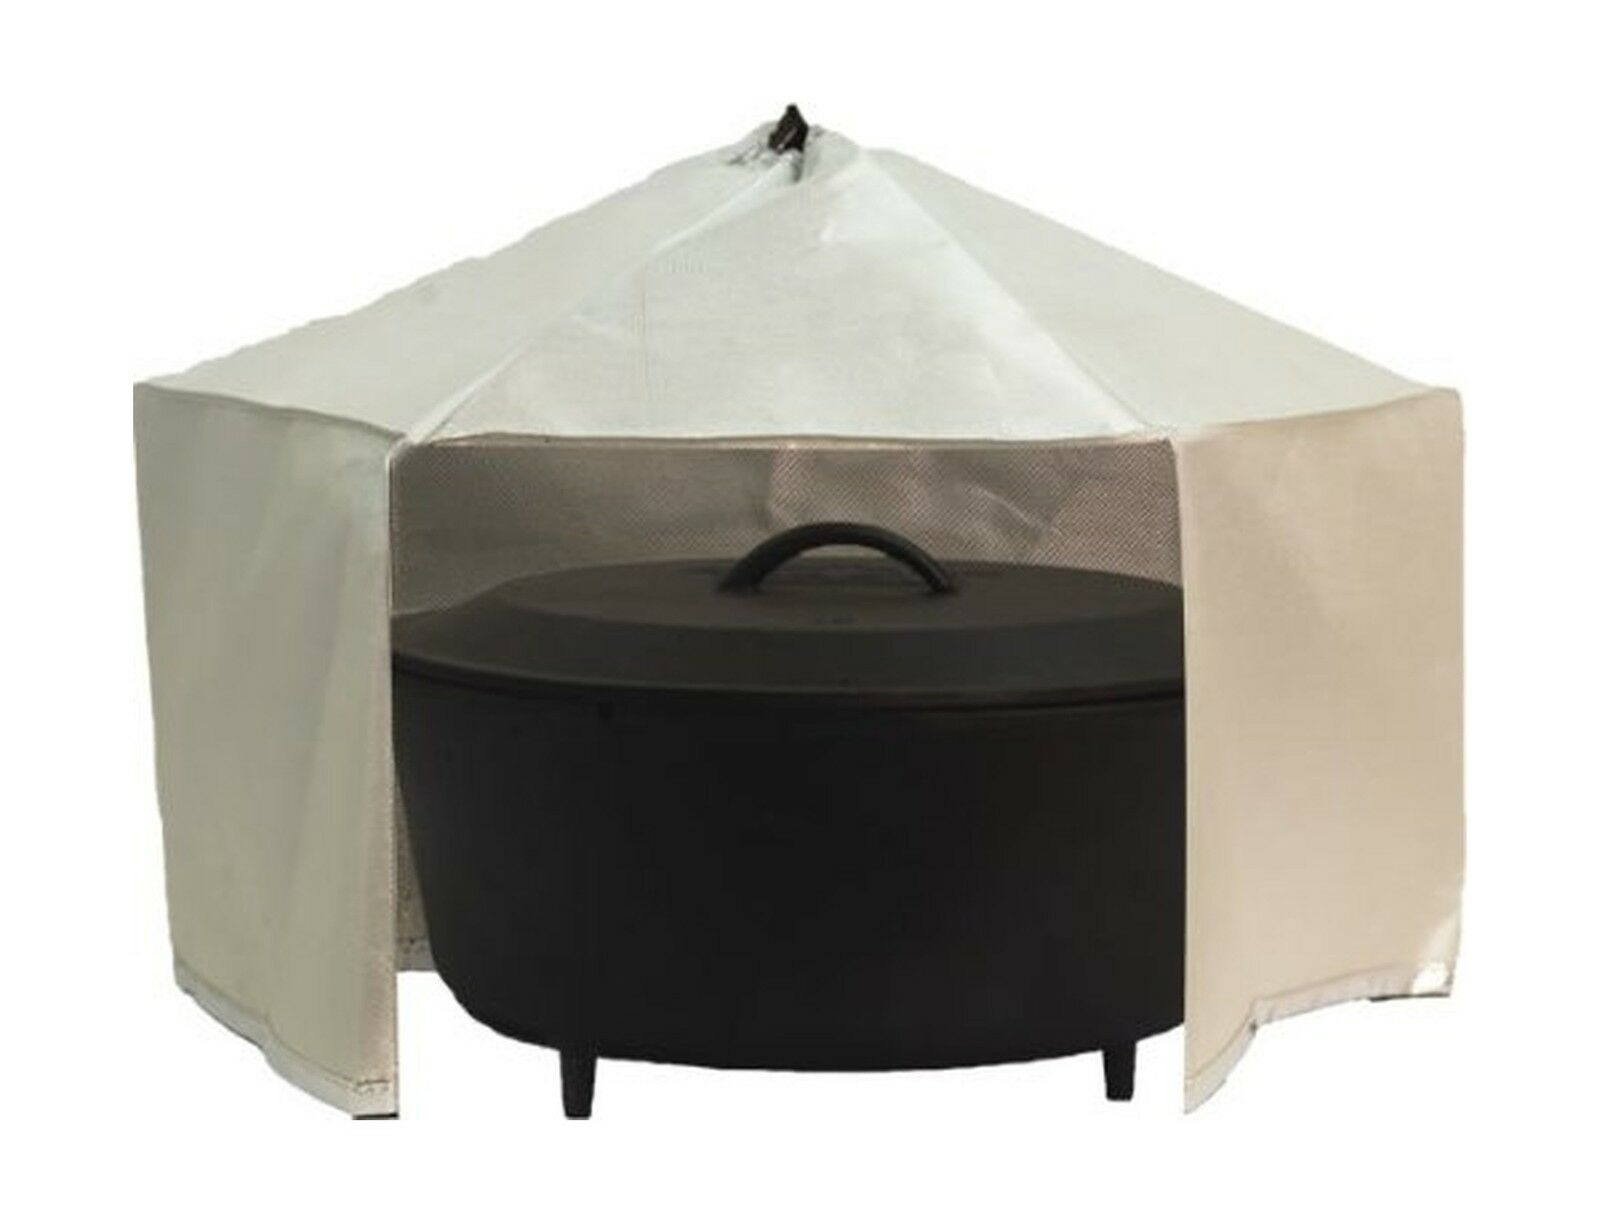 Camp Chef Dutch Oven  Dome for Propane Grill Free Shipping  unique shape